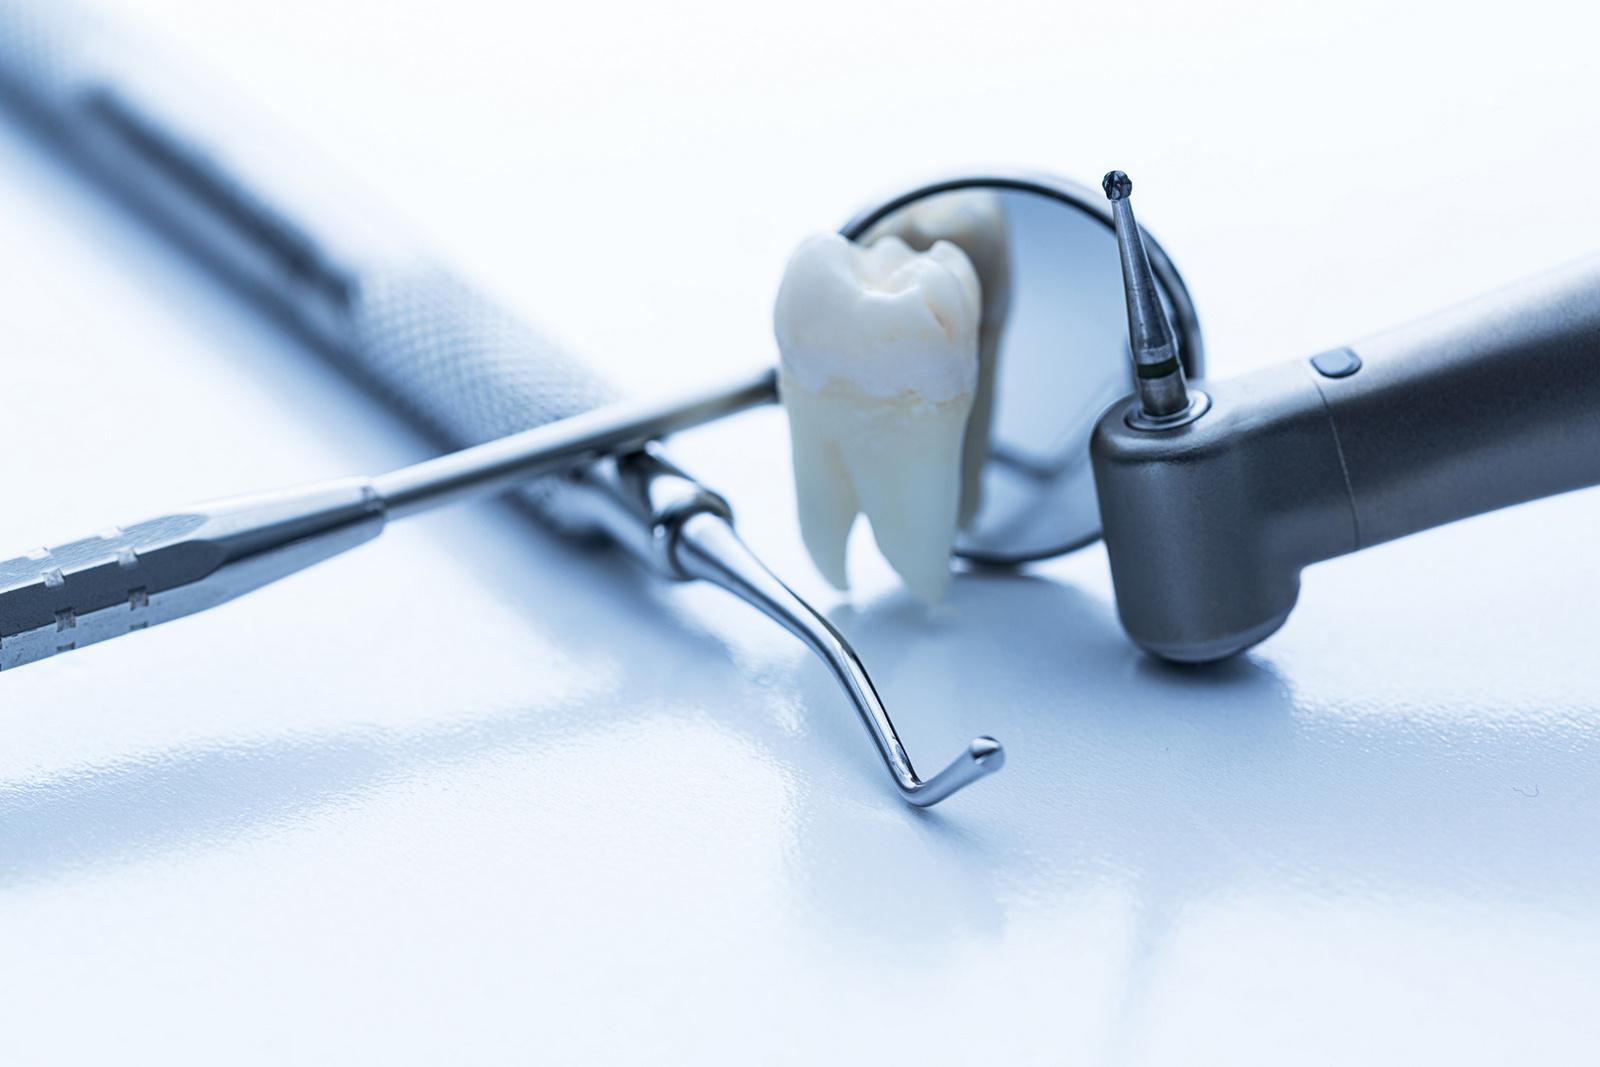 apparecchiature dentista